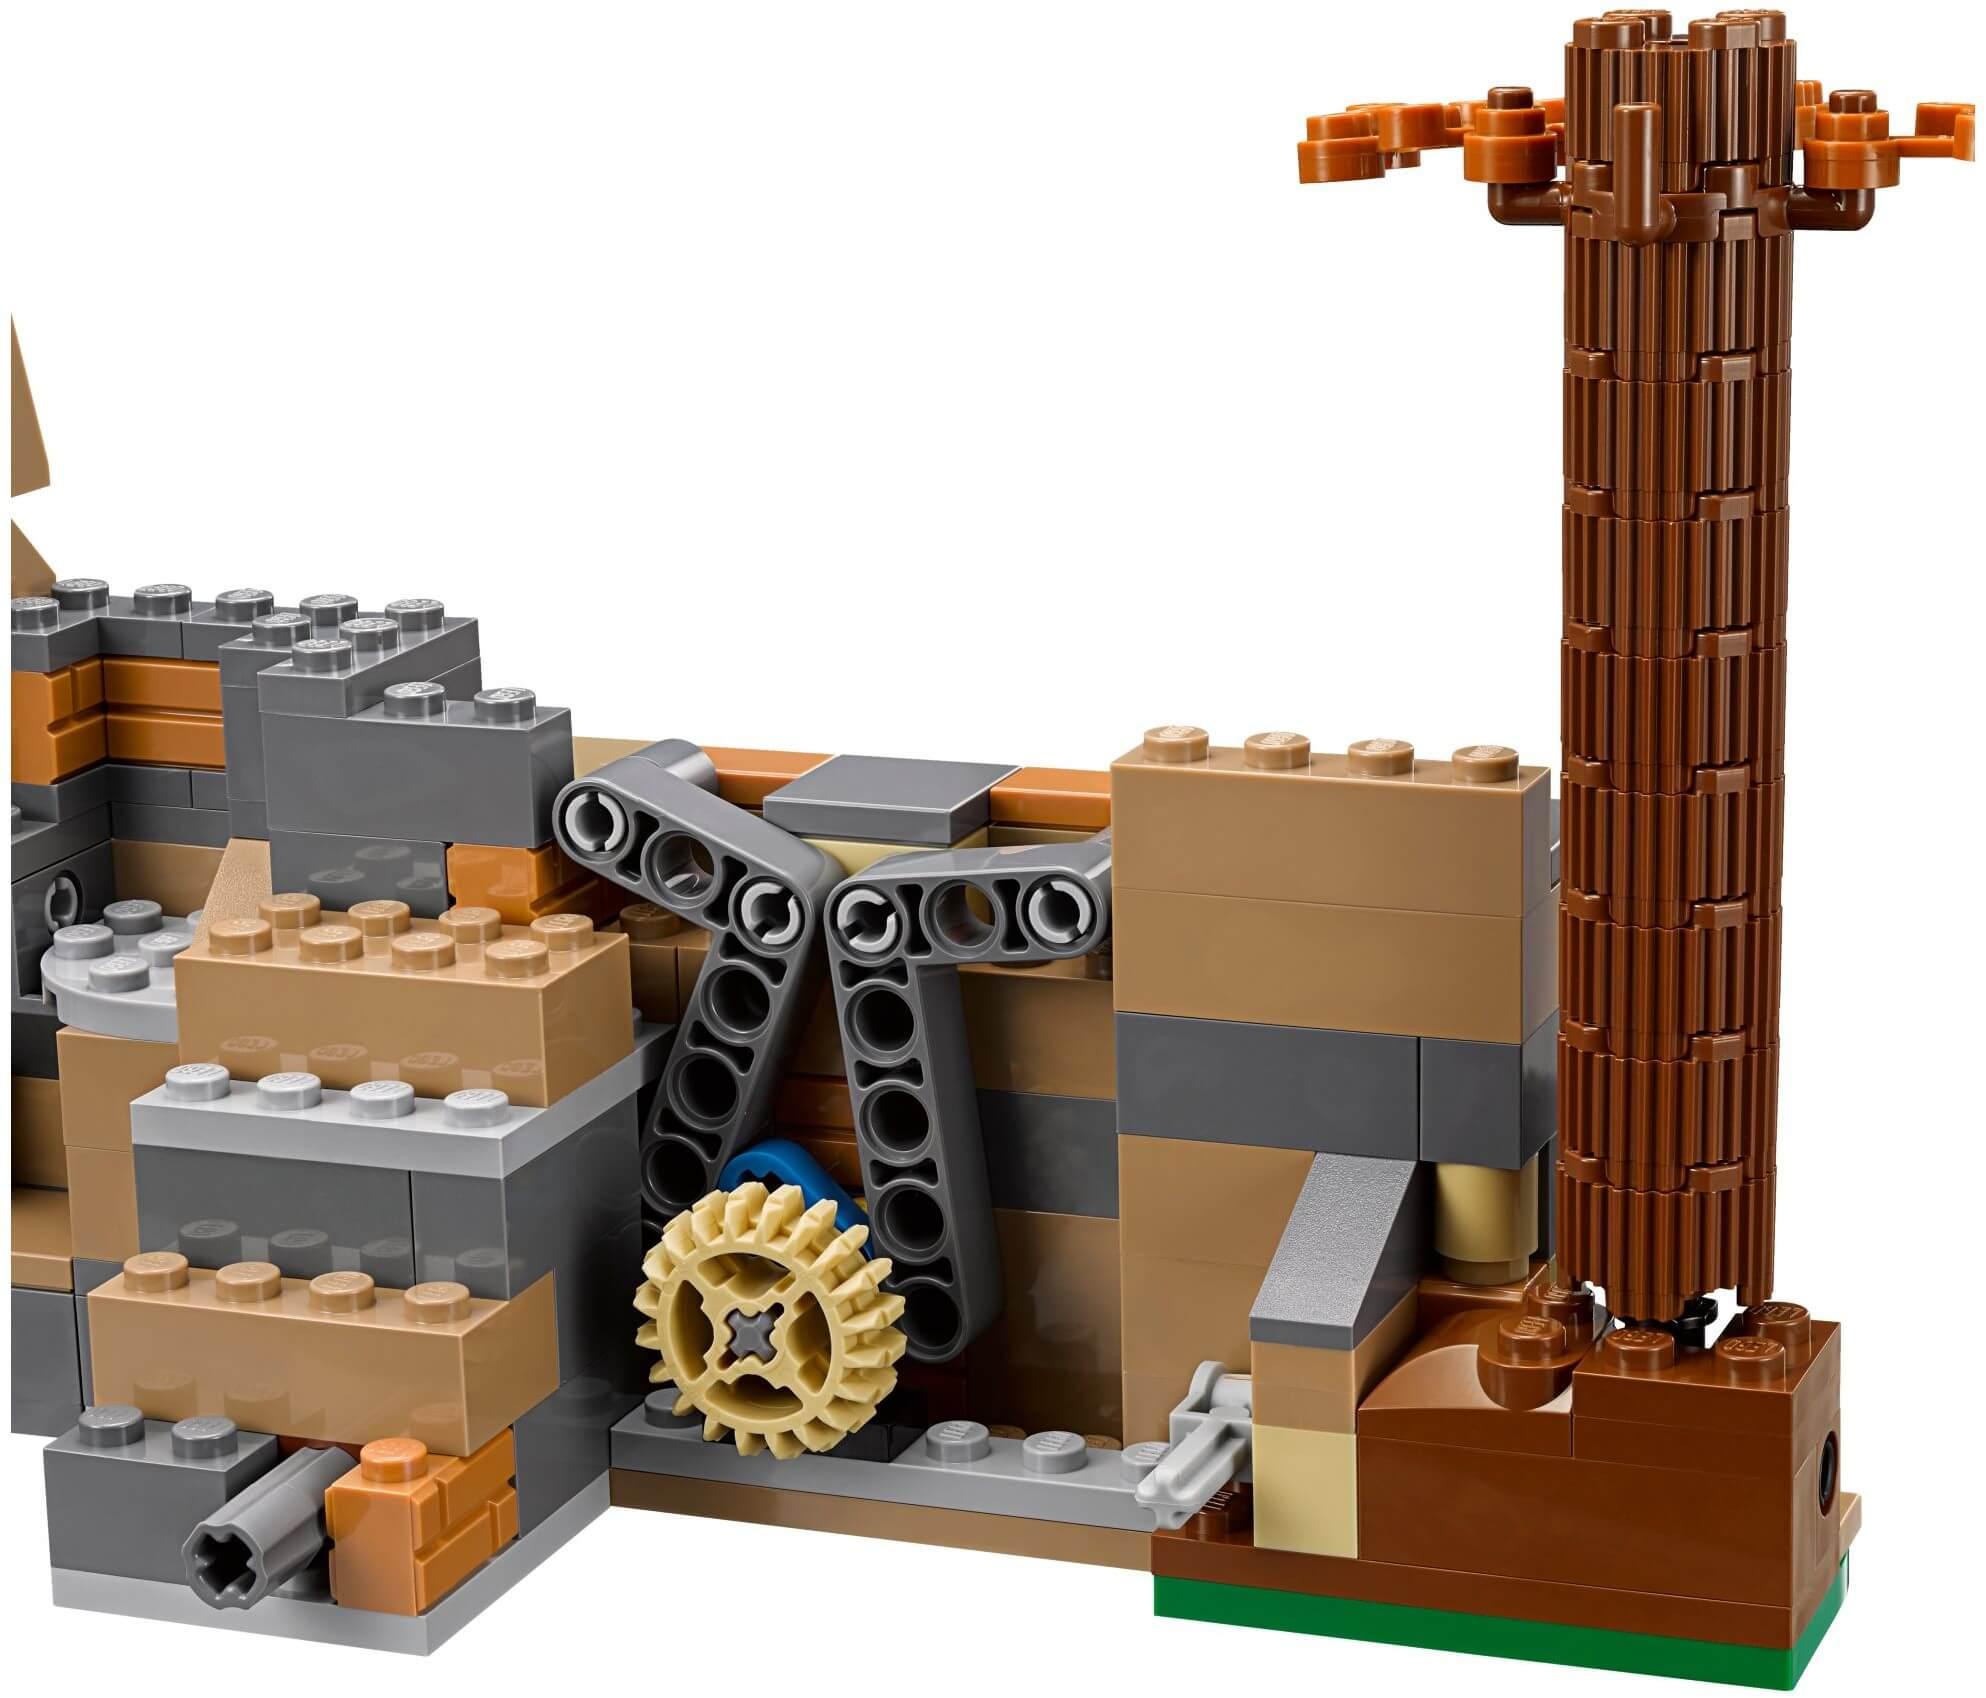 Mua đồ chơi LEGO 75139 - LEGO Star Wars 75139 - Cuộc chiến trên hành tinh Takodana (LEGO Star Wars Battle on Takodana 75139)